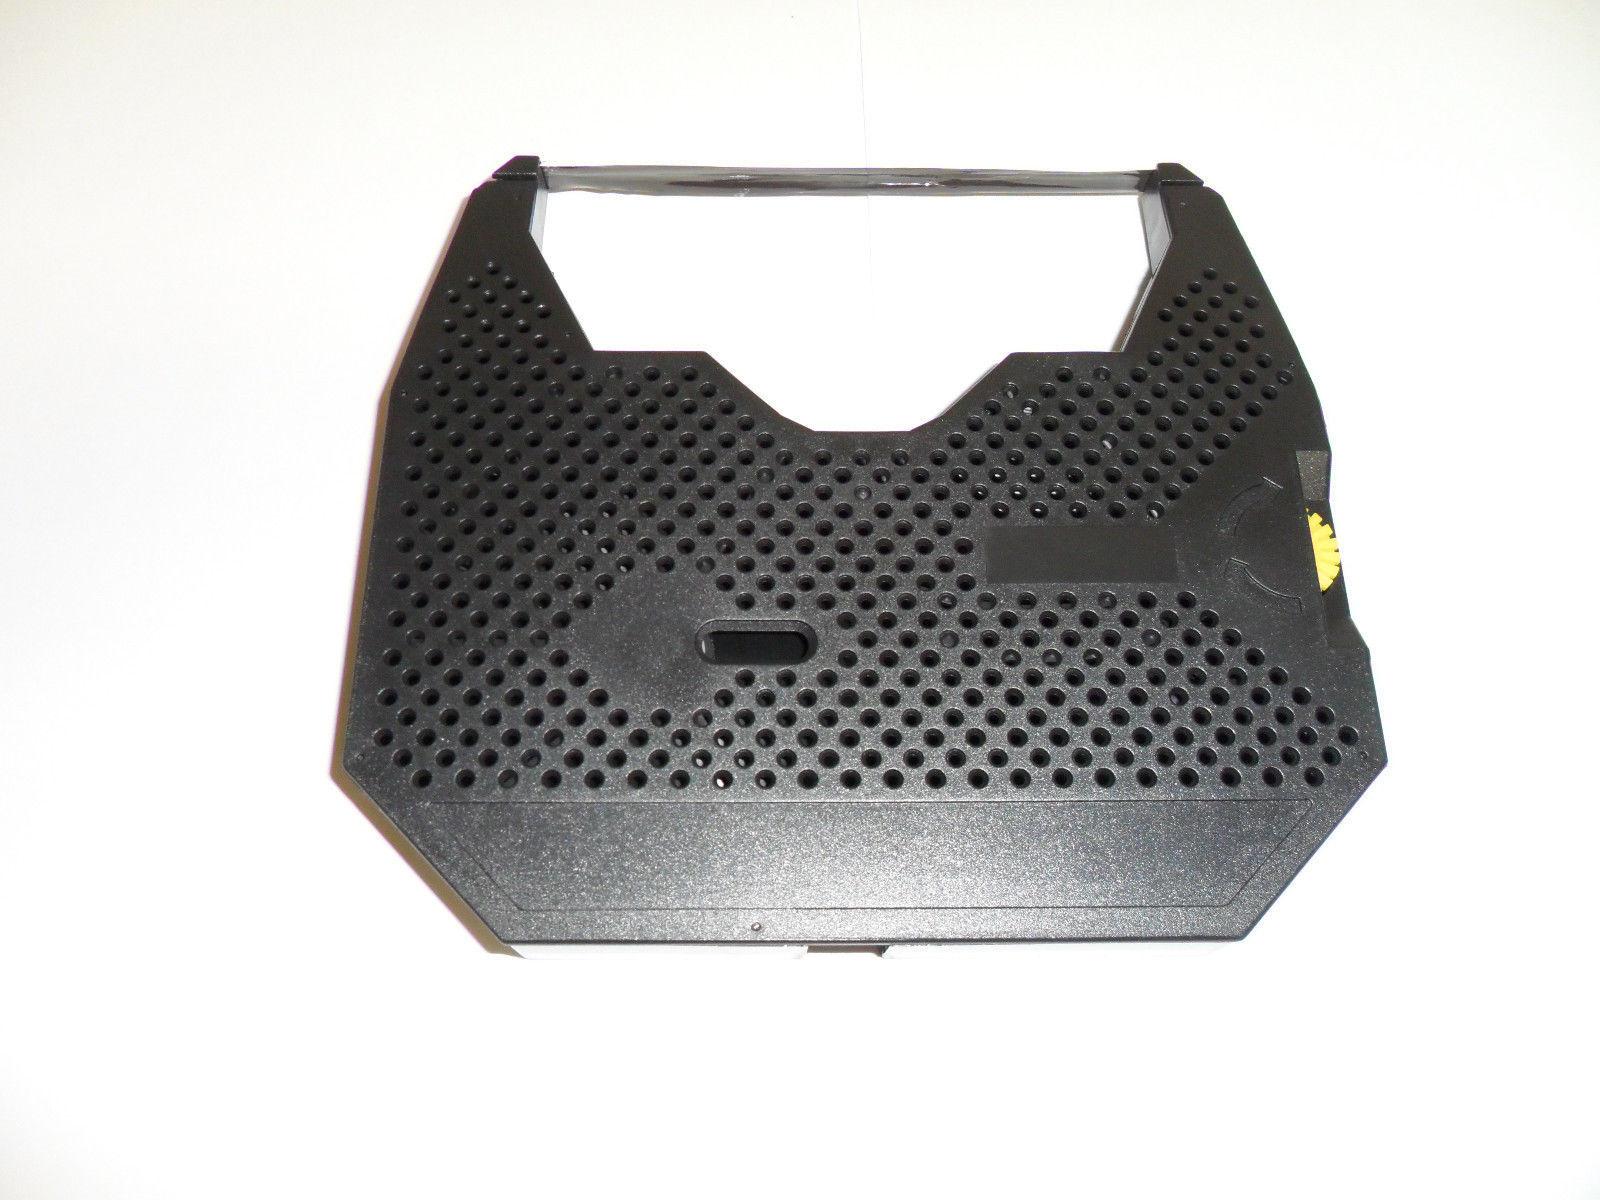 Sharp XQ315 XQ320 XQ325 XQ340 XQ345 XQ345A Typewriter Ribbon